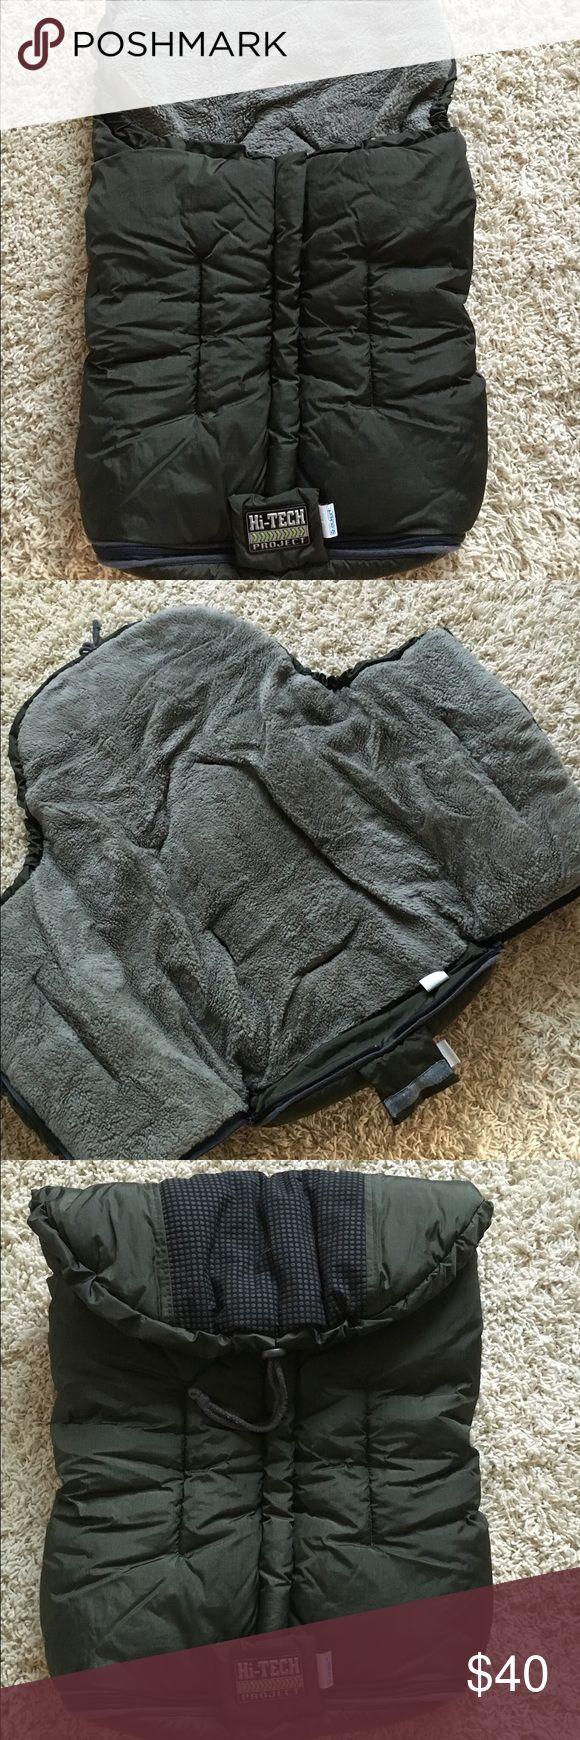 "Very warm baby footmuff/ stroller cover Dim. 28"" long"